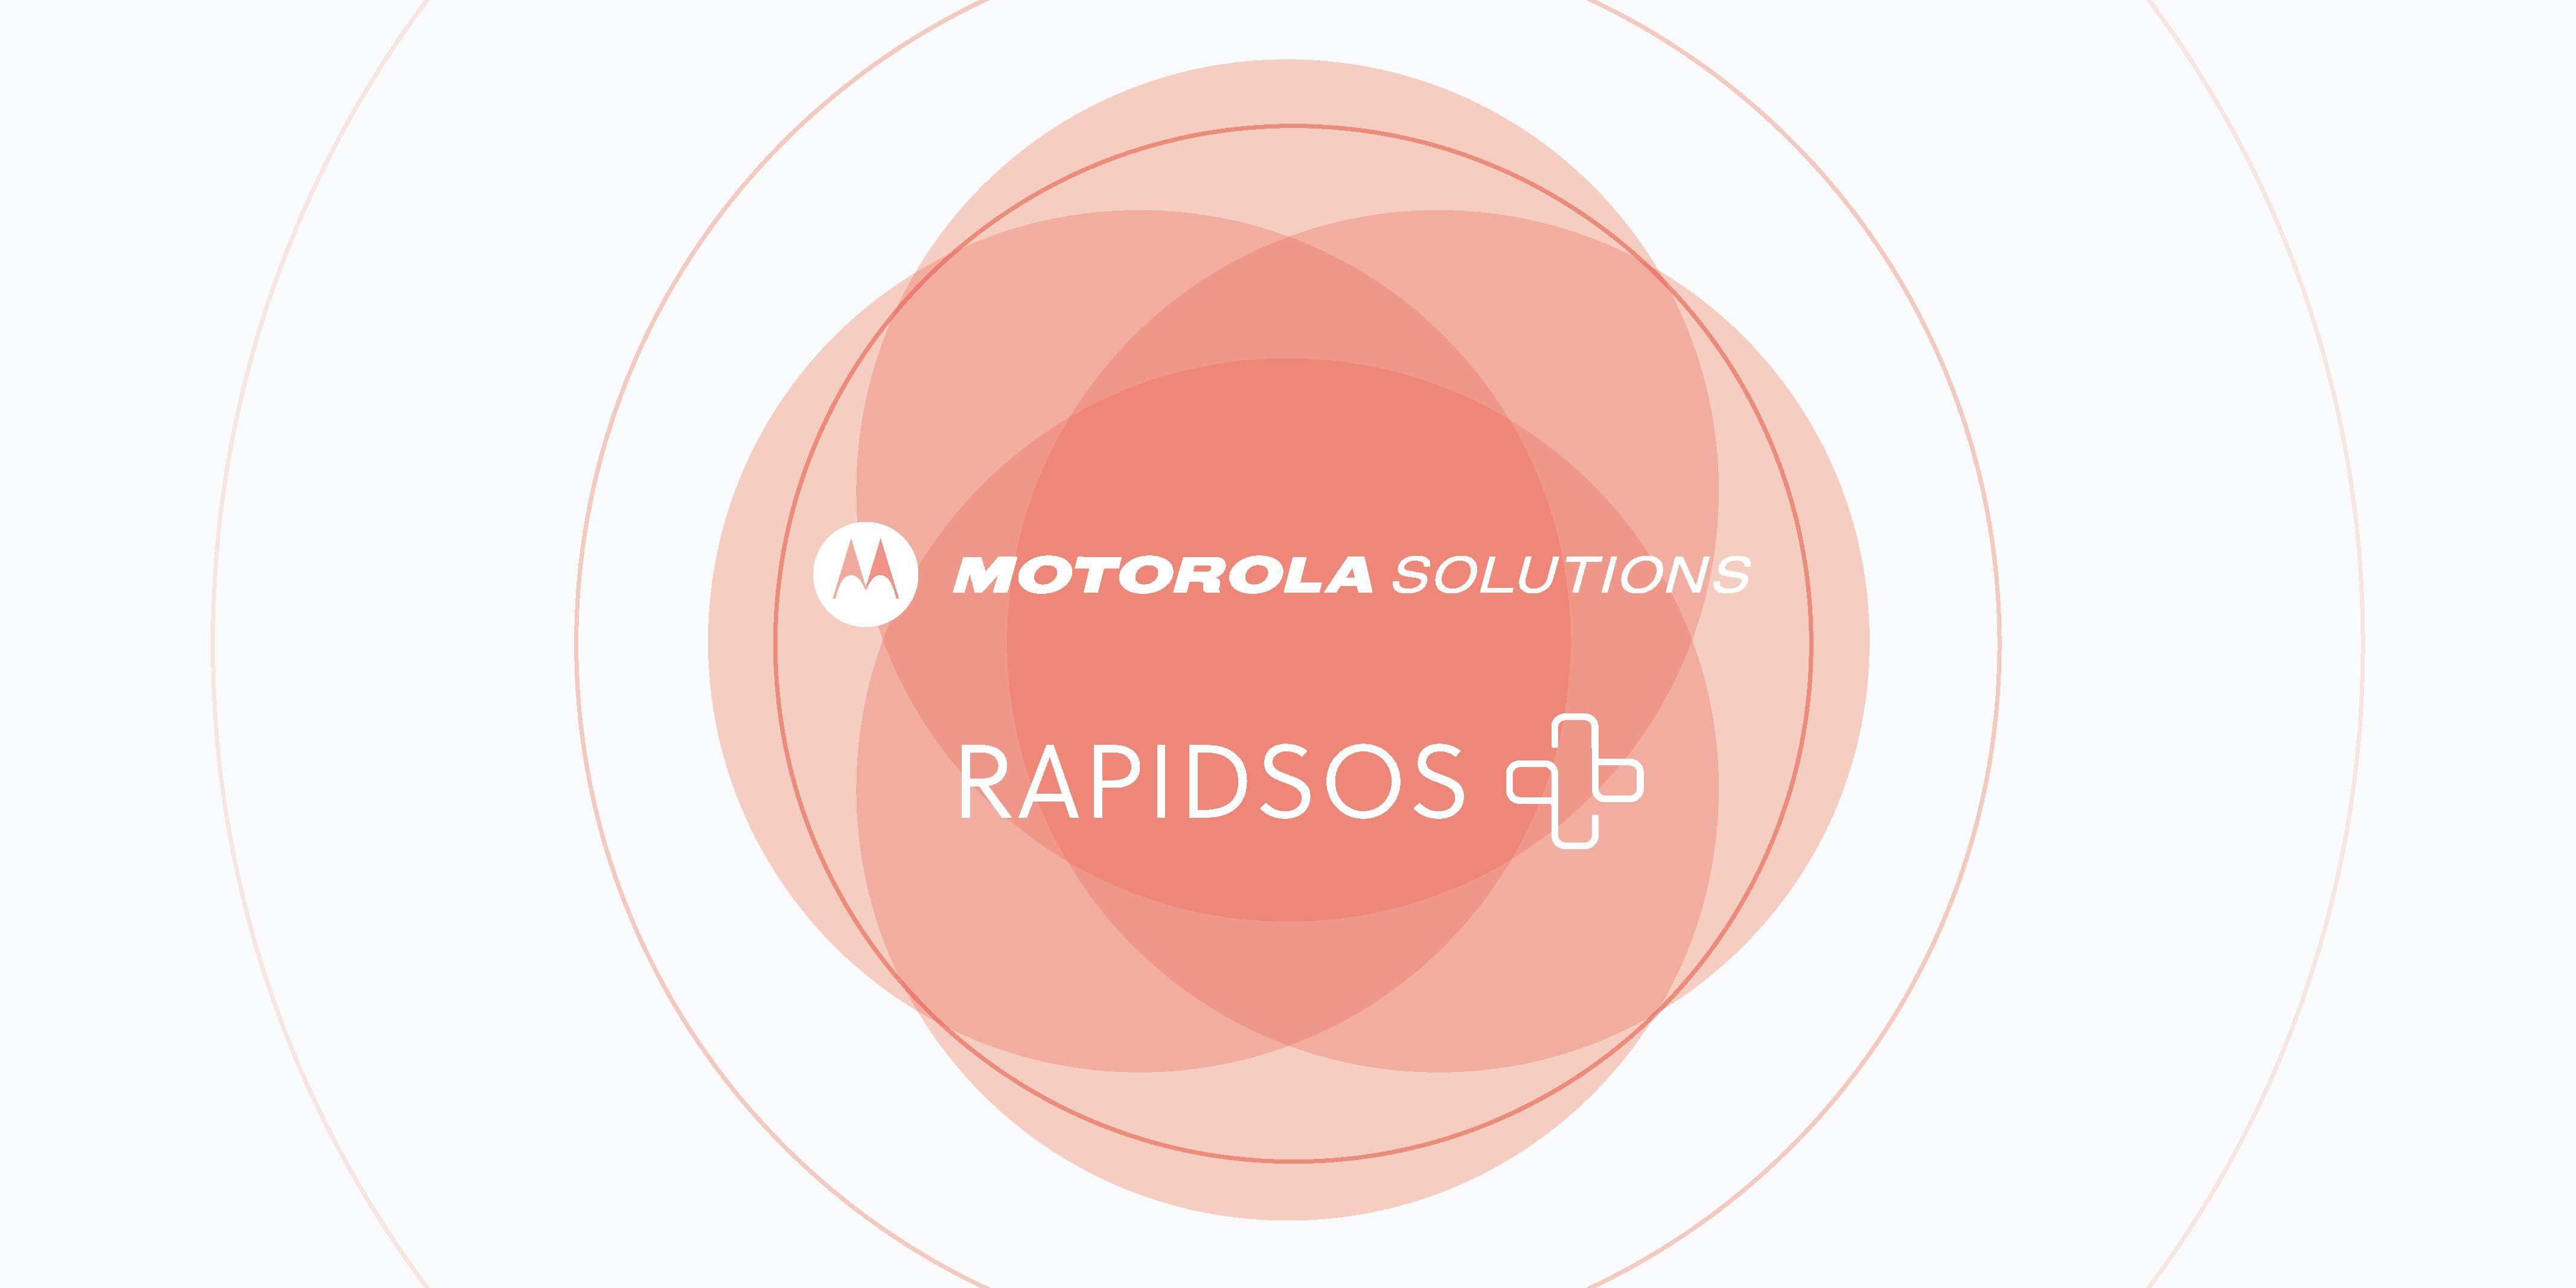 Motorola Solutions and RapidSOS data integration logo